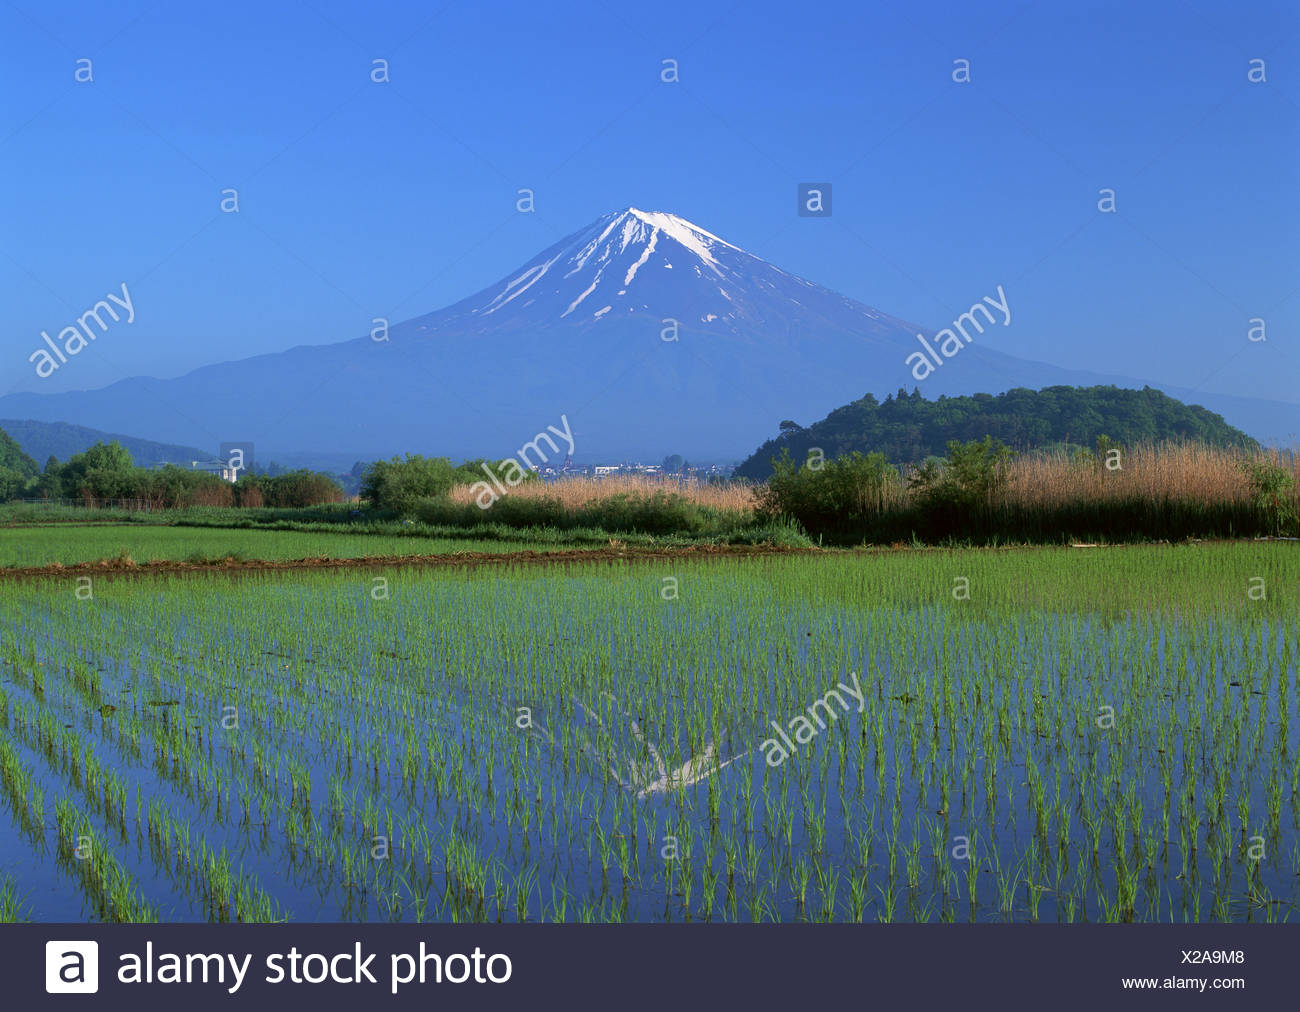 Rice field and Mt. Fuji - Stock Image